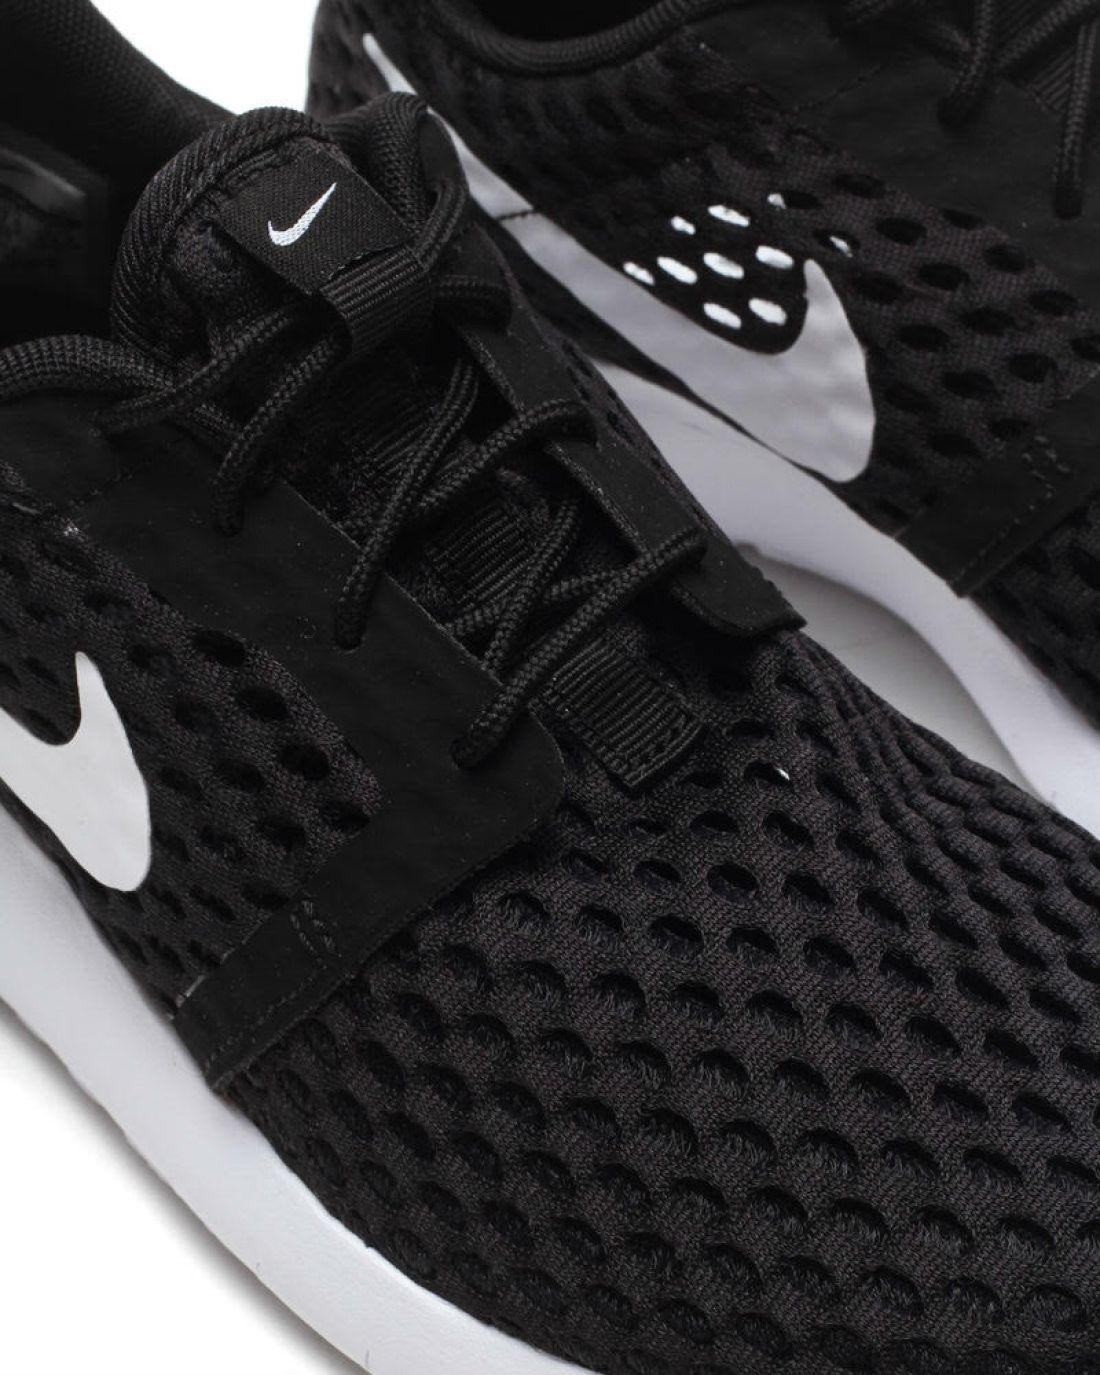 brand new 39e24 ebb88 Nike Roshe One Flight Weight GS Black/White // Available Now ...